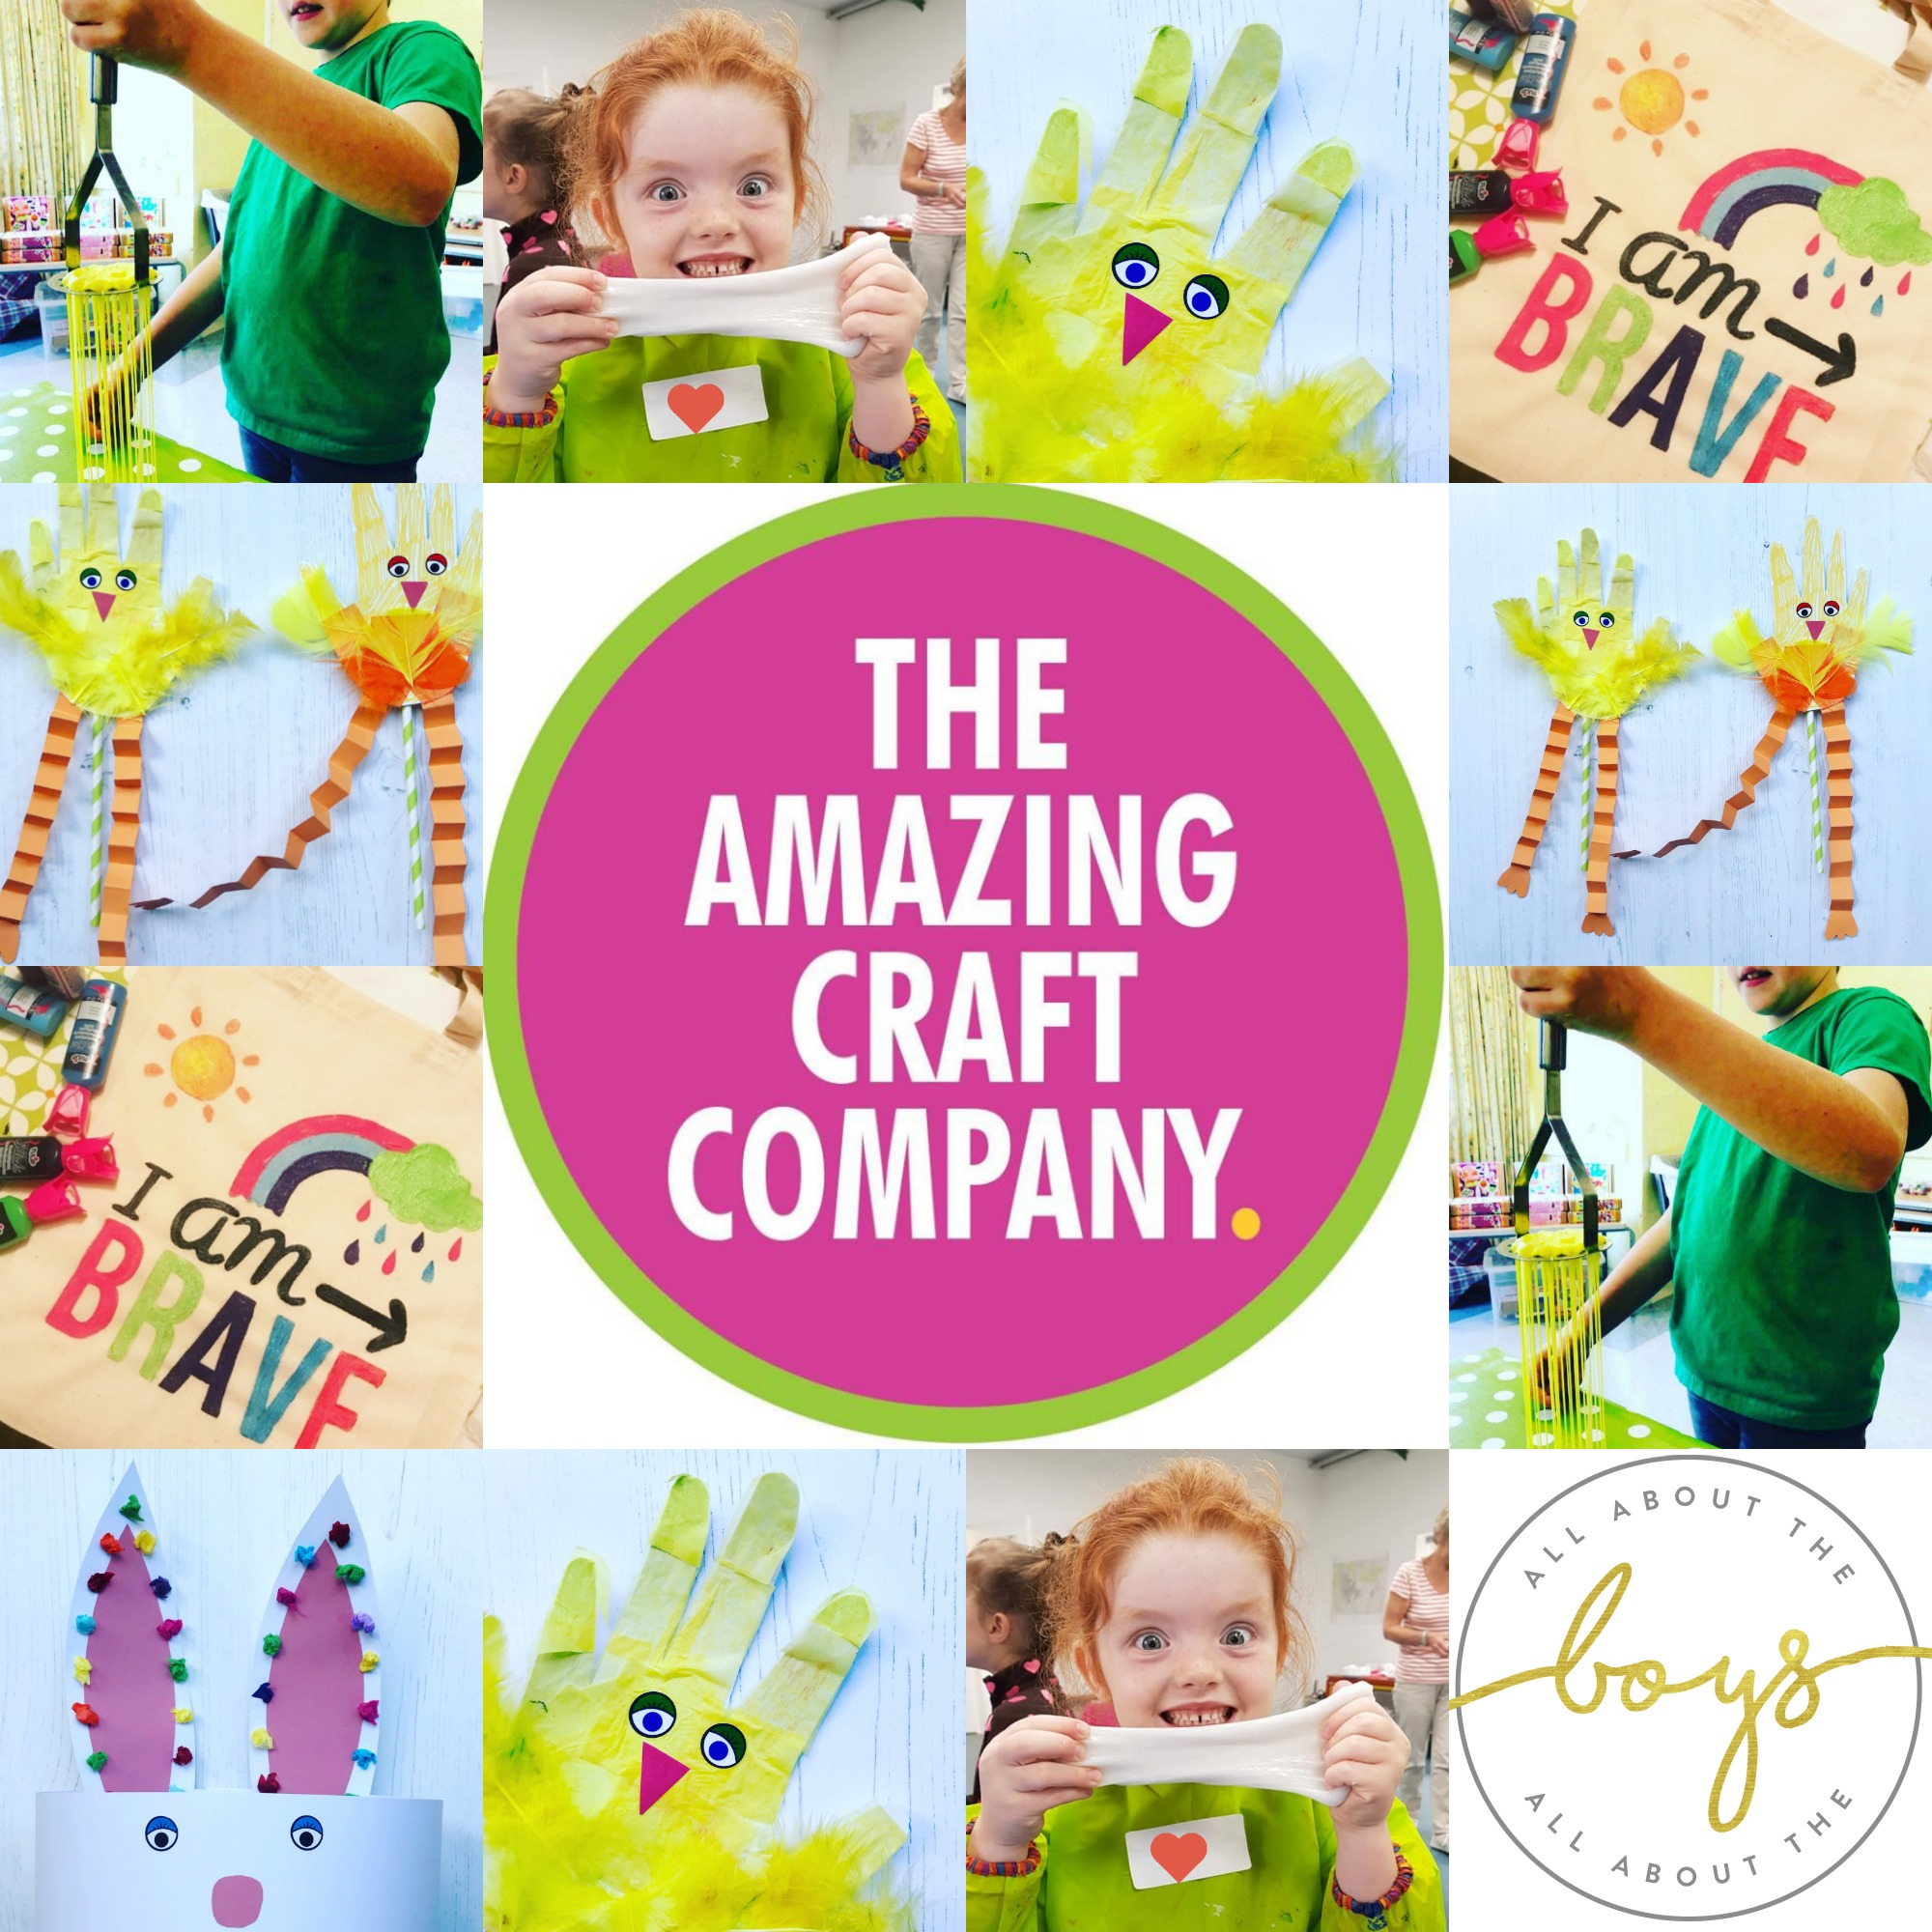 Amazing Craft Company